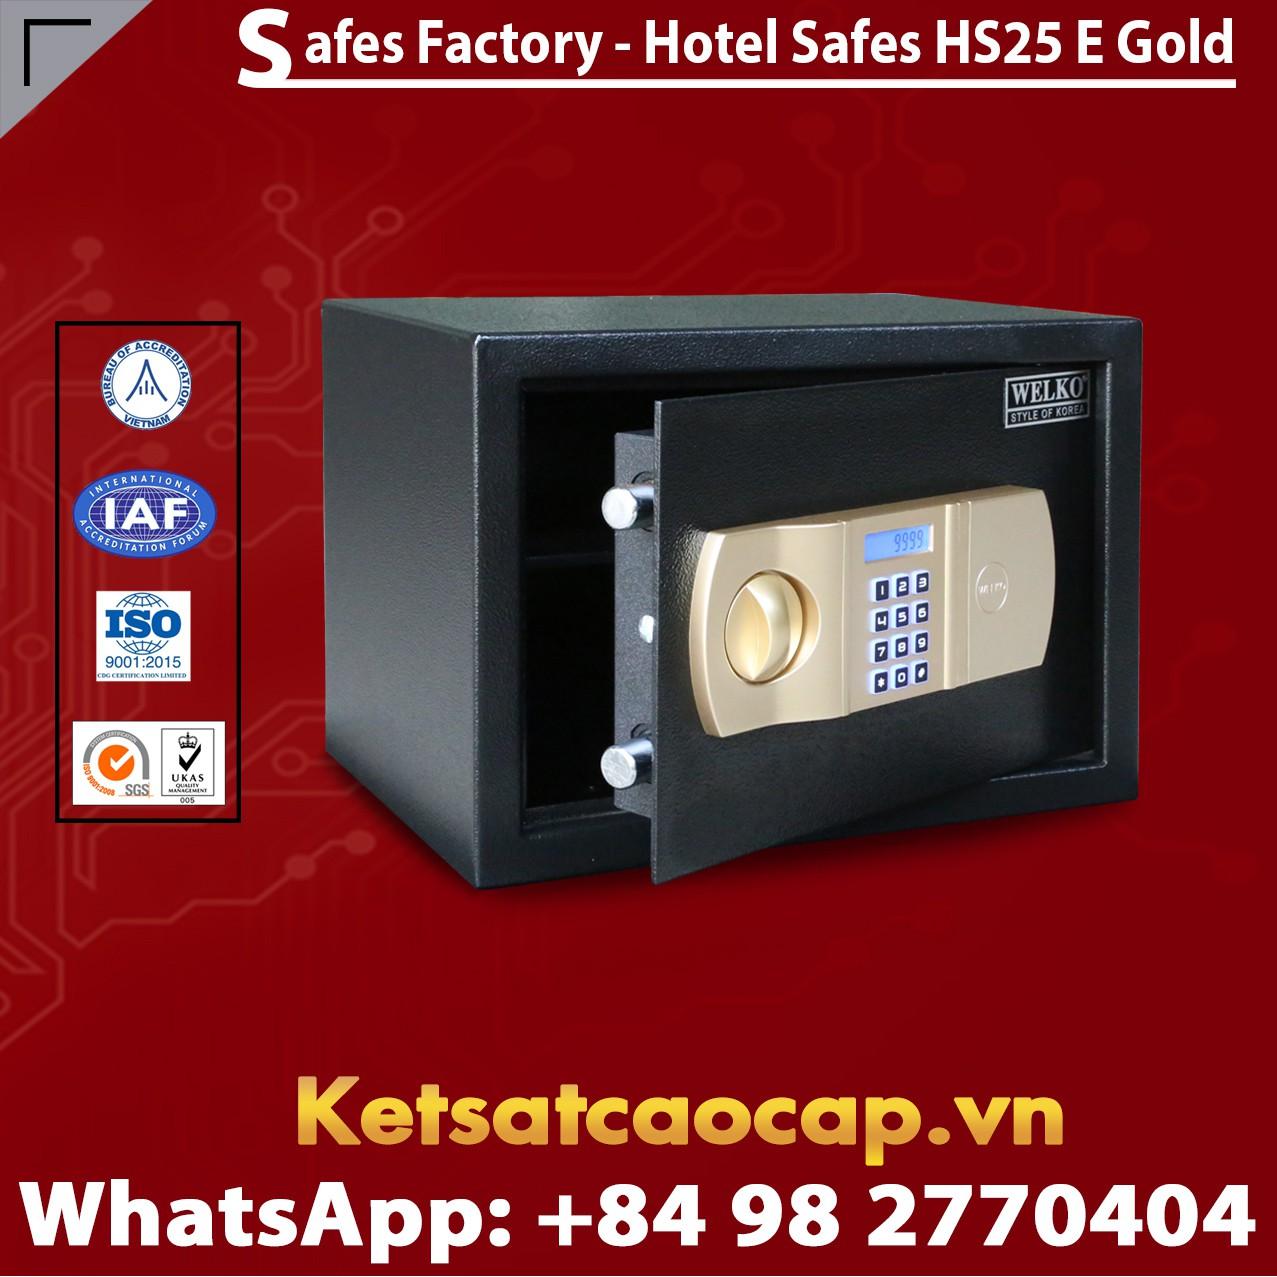 Hotel Safes  WELKO HS25 E Gold